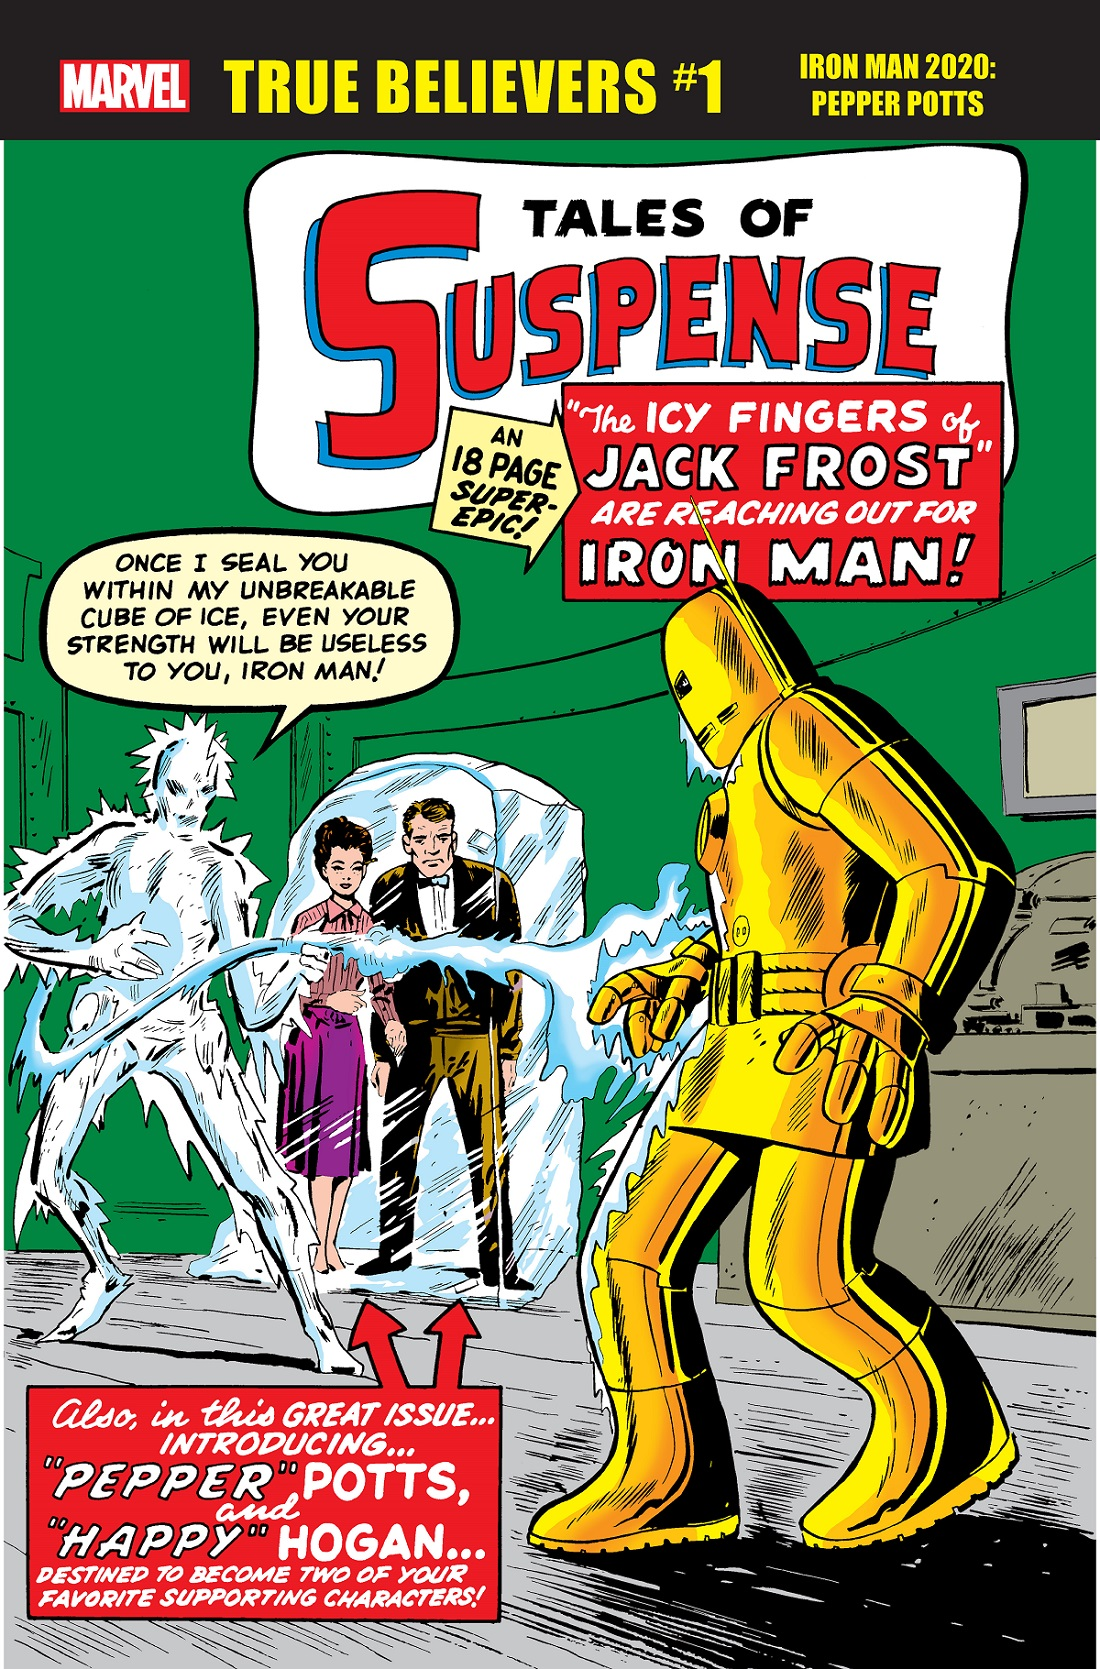 True Believers: Iron Man 2020 - Pepper Potts (2020) #1